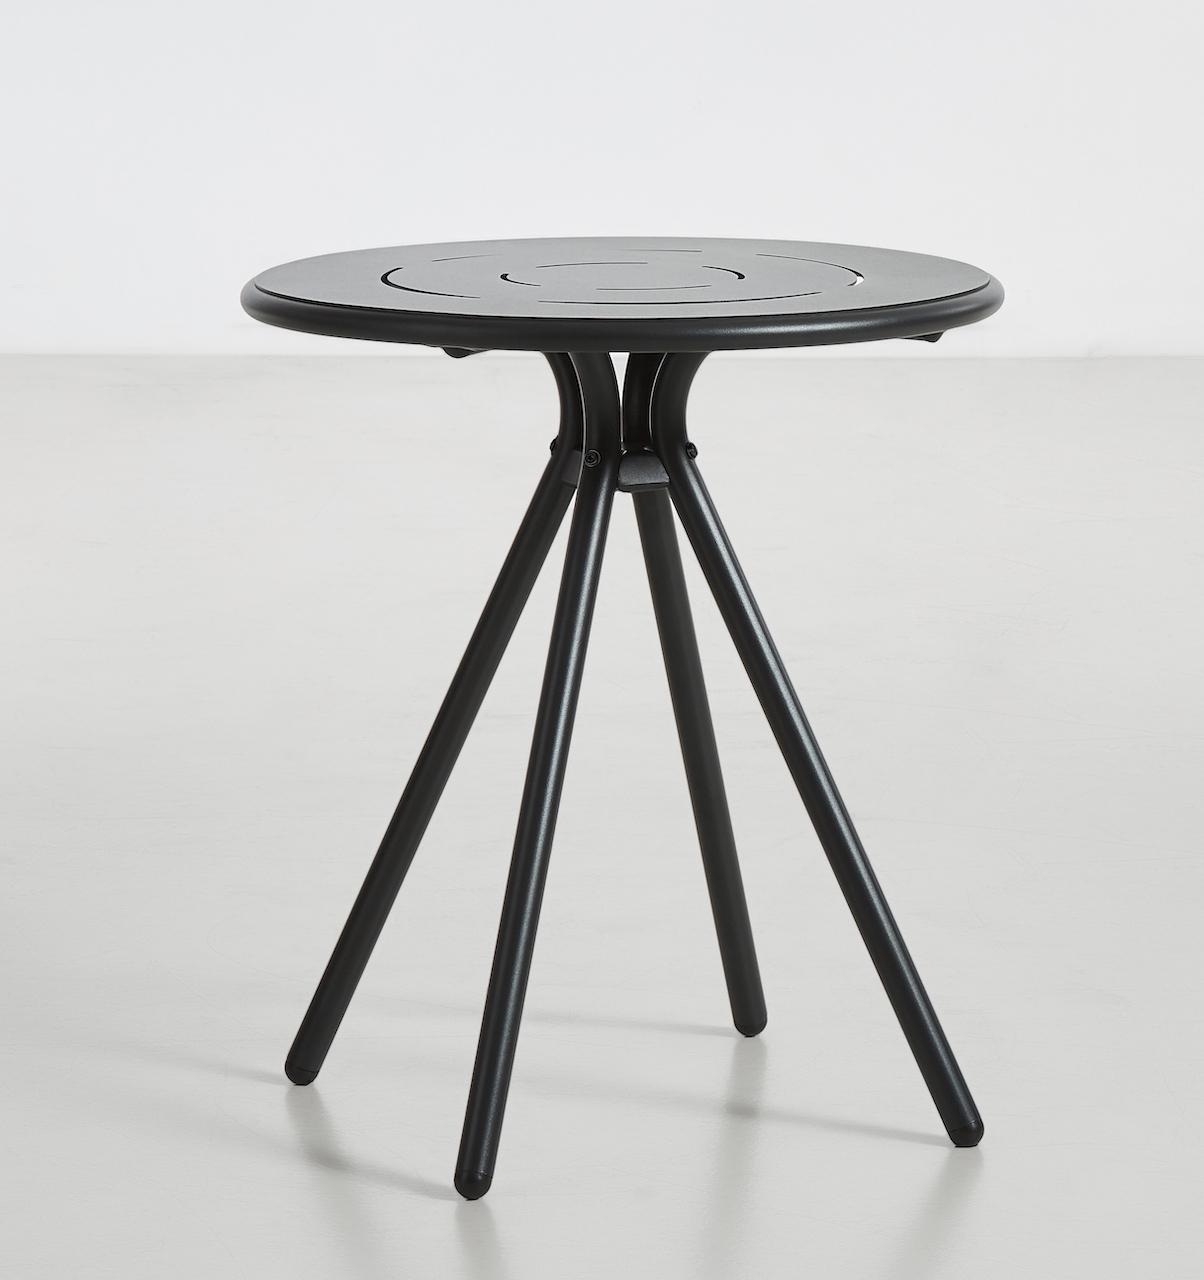 Woud Ray Café Table rund schwarz